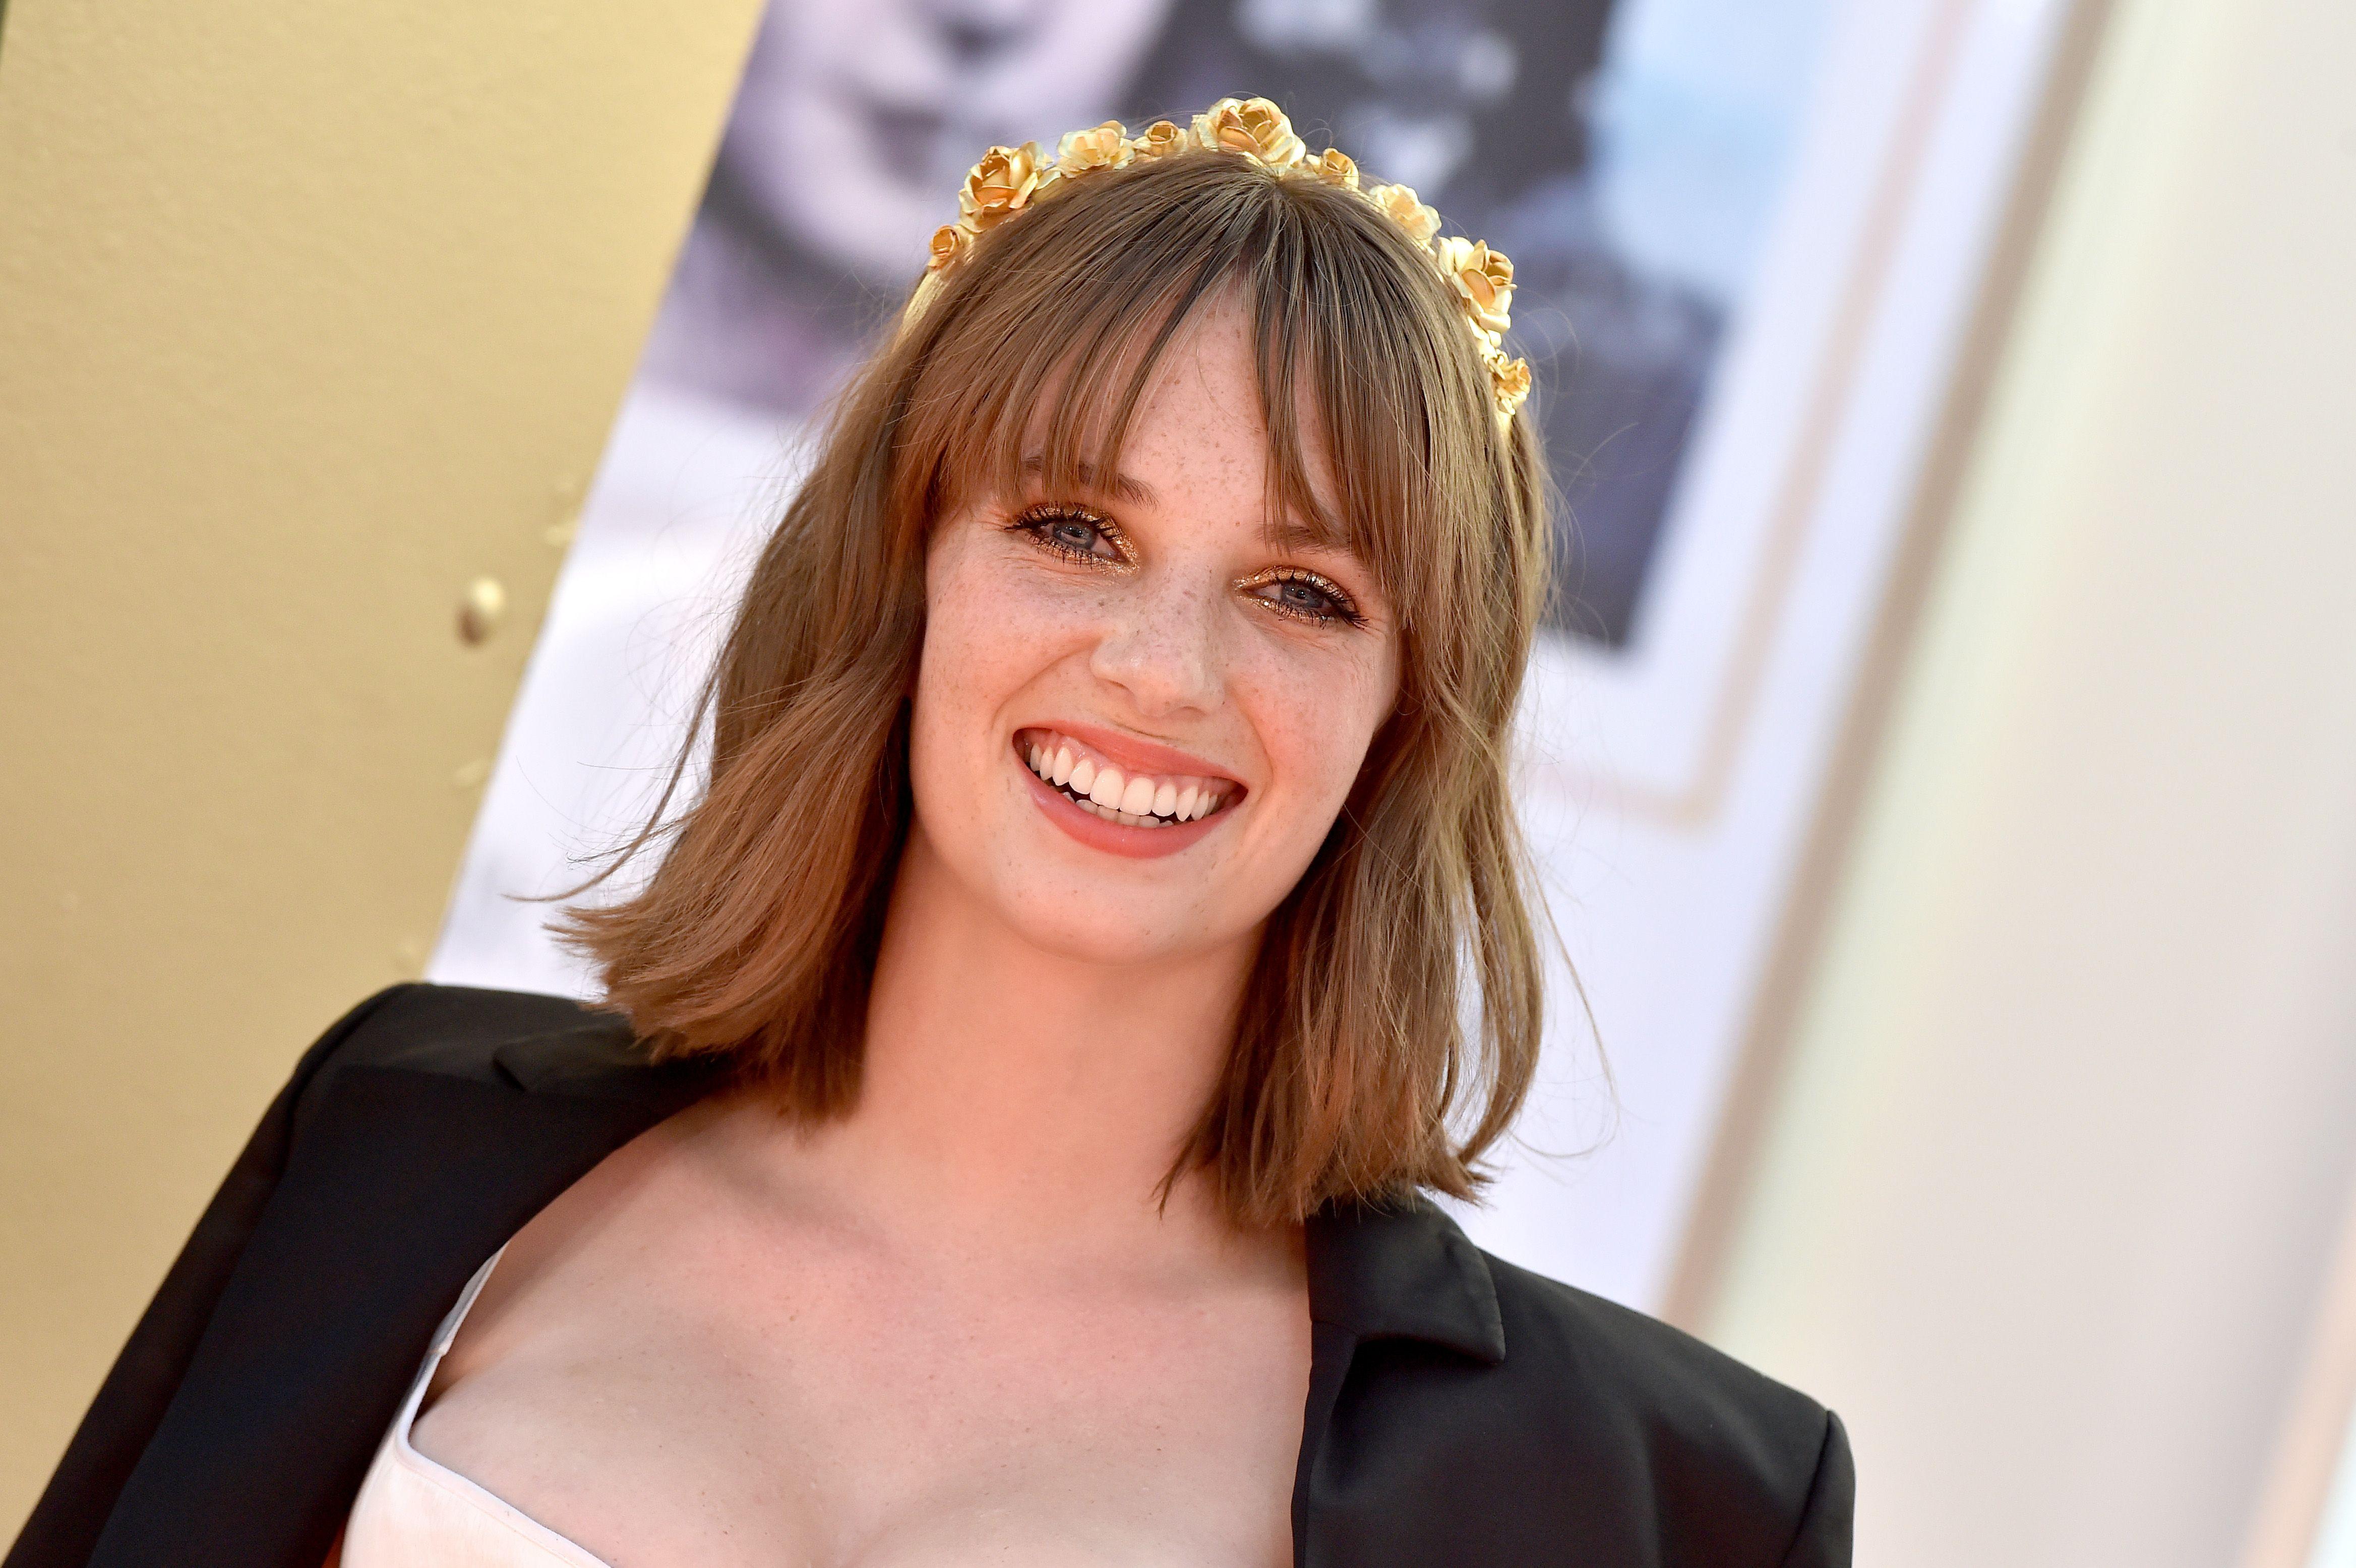 Maya Hawke, Robin en 'Stranger Things', prepara su debut musical